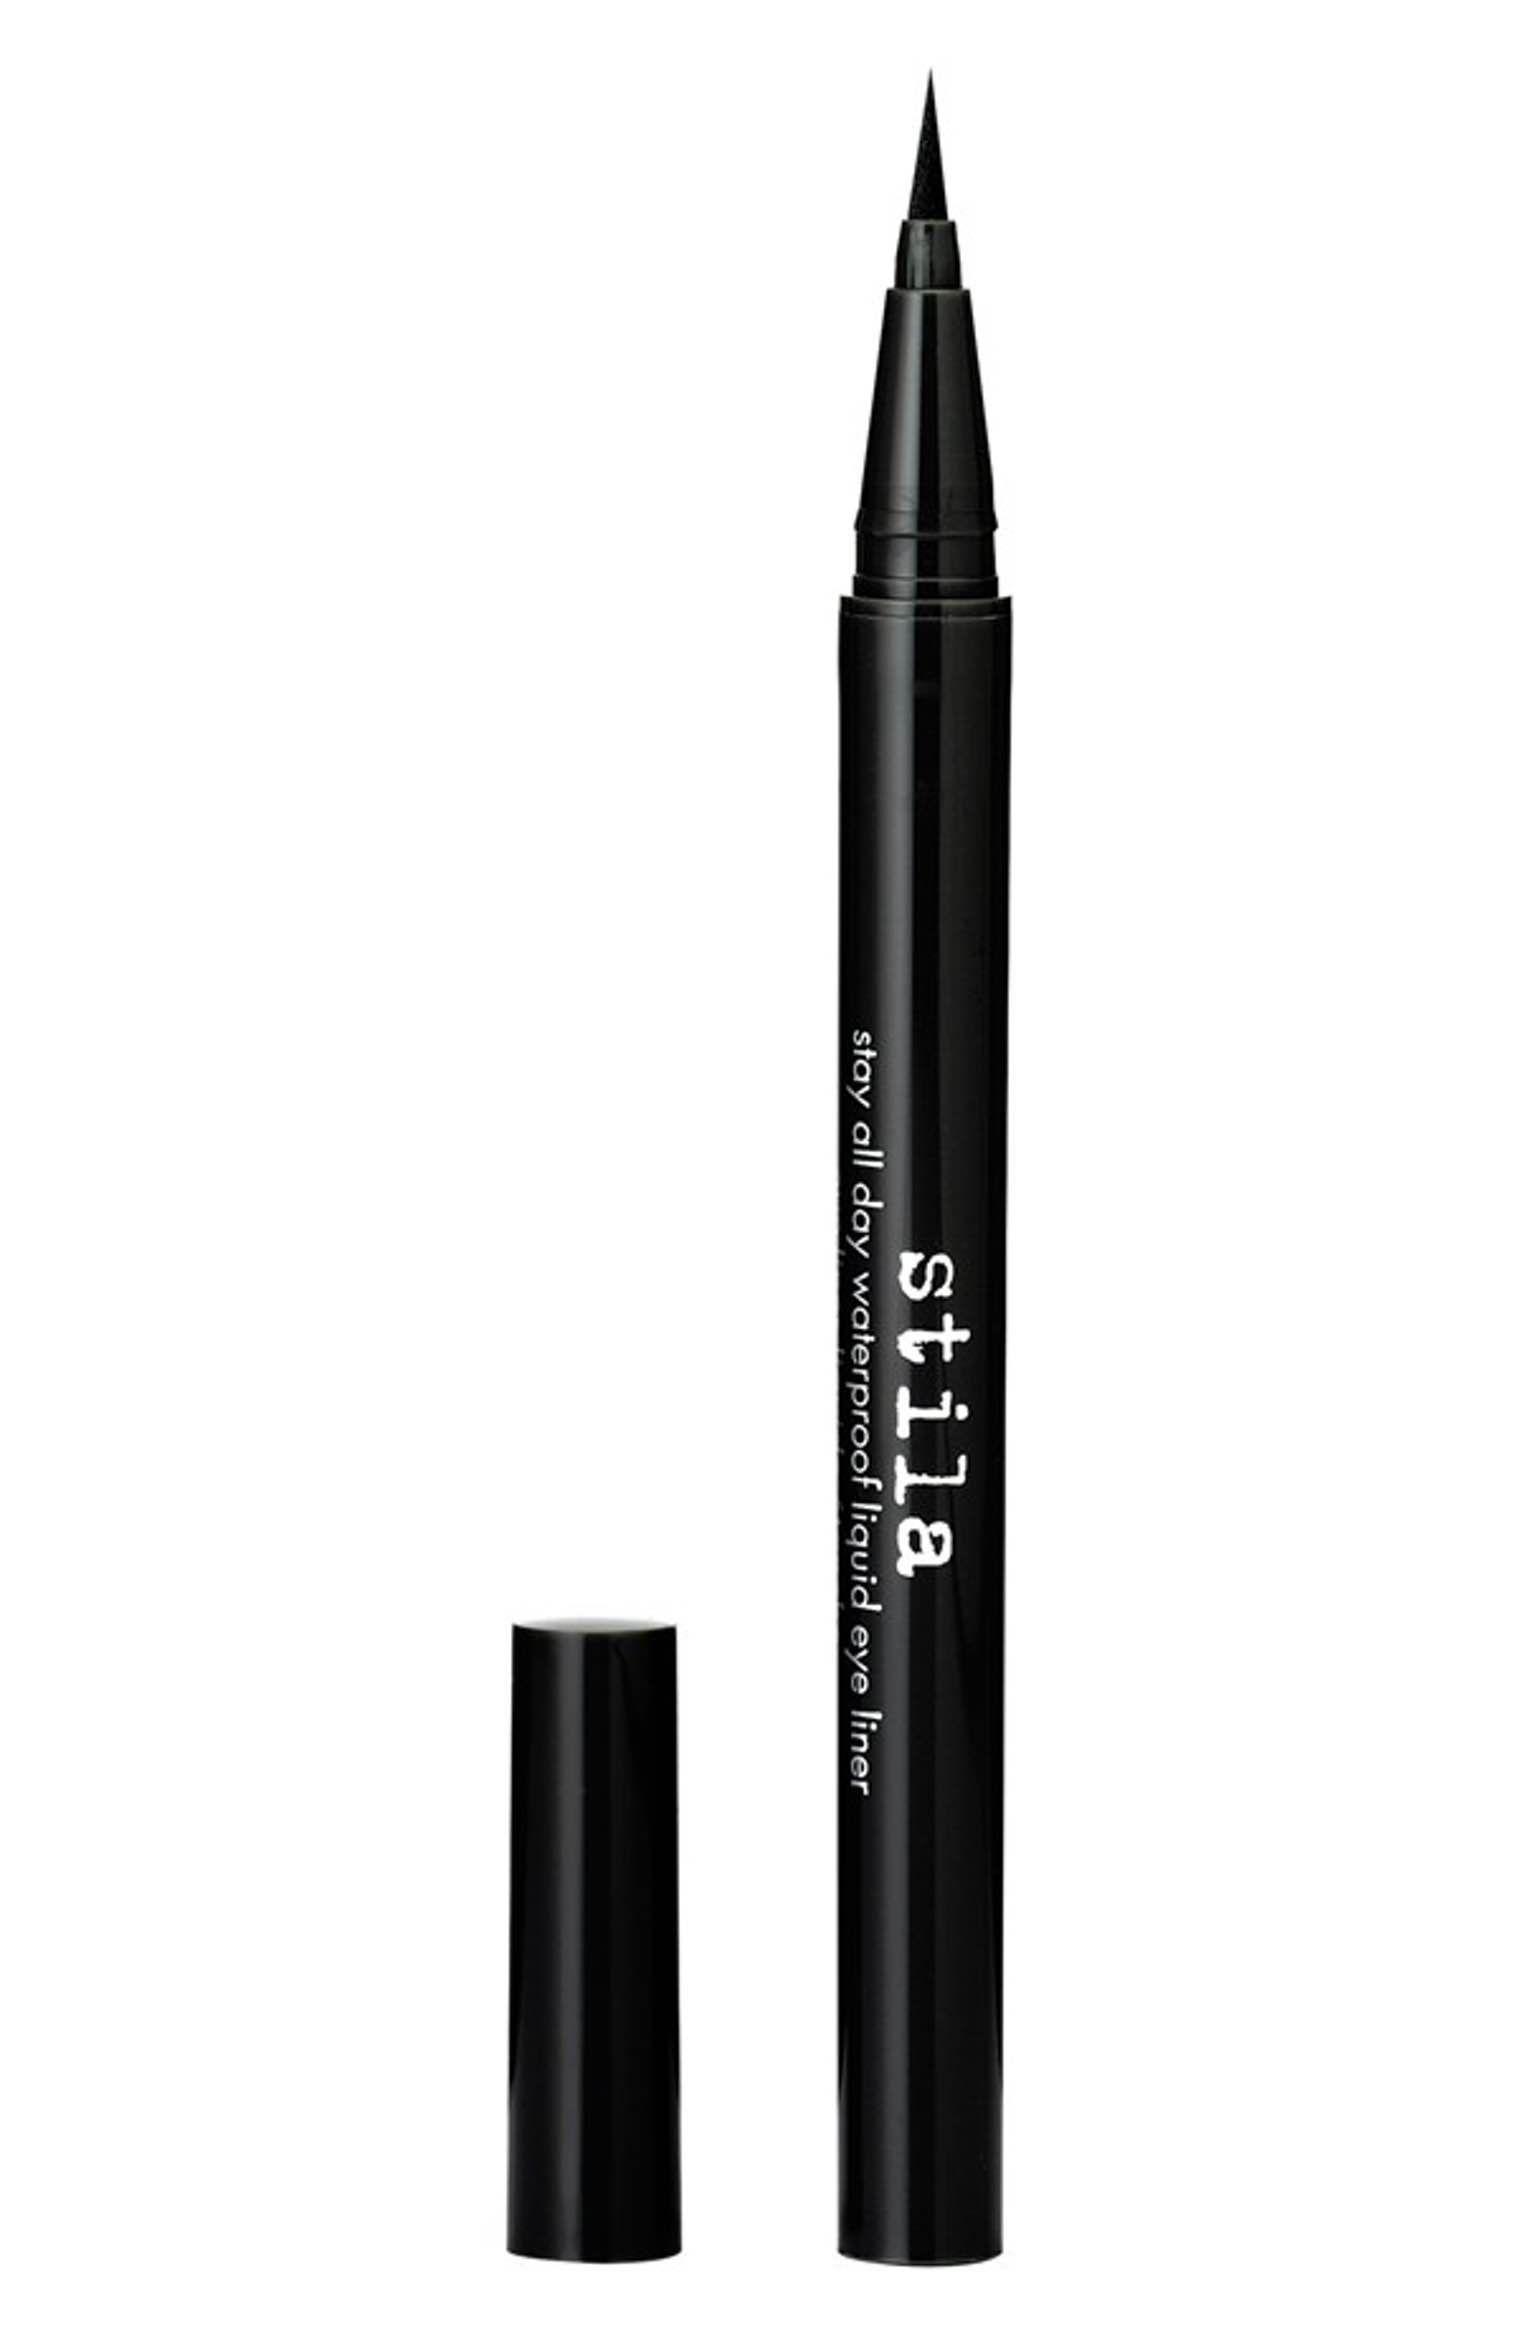 5d699771d39 stila 'stay all day' waterproof liquid eyeliner | Hair | Eyeliner ...